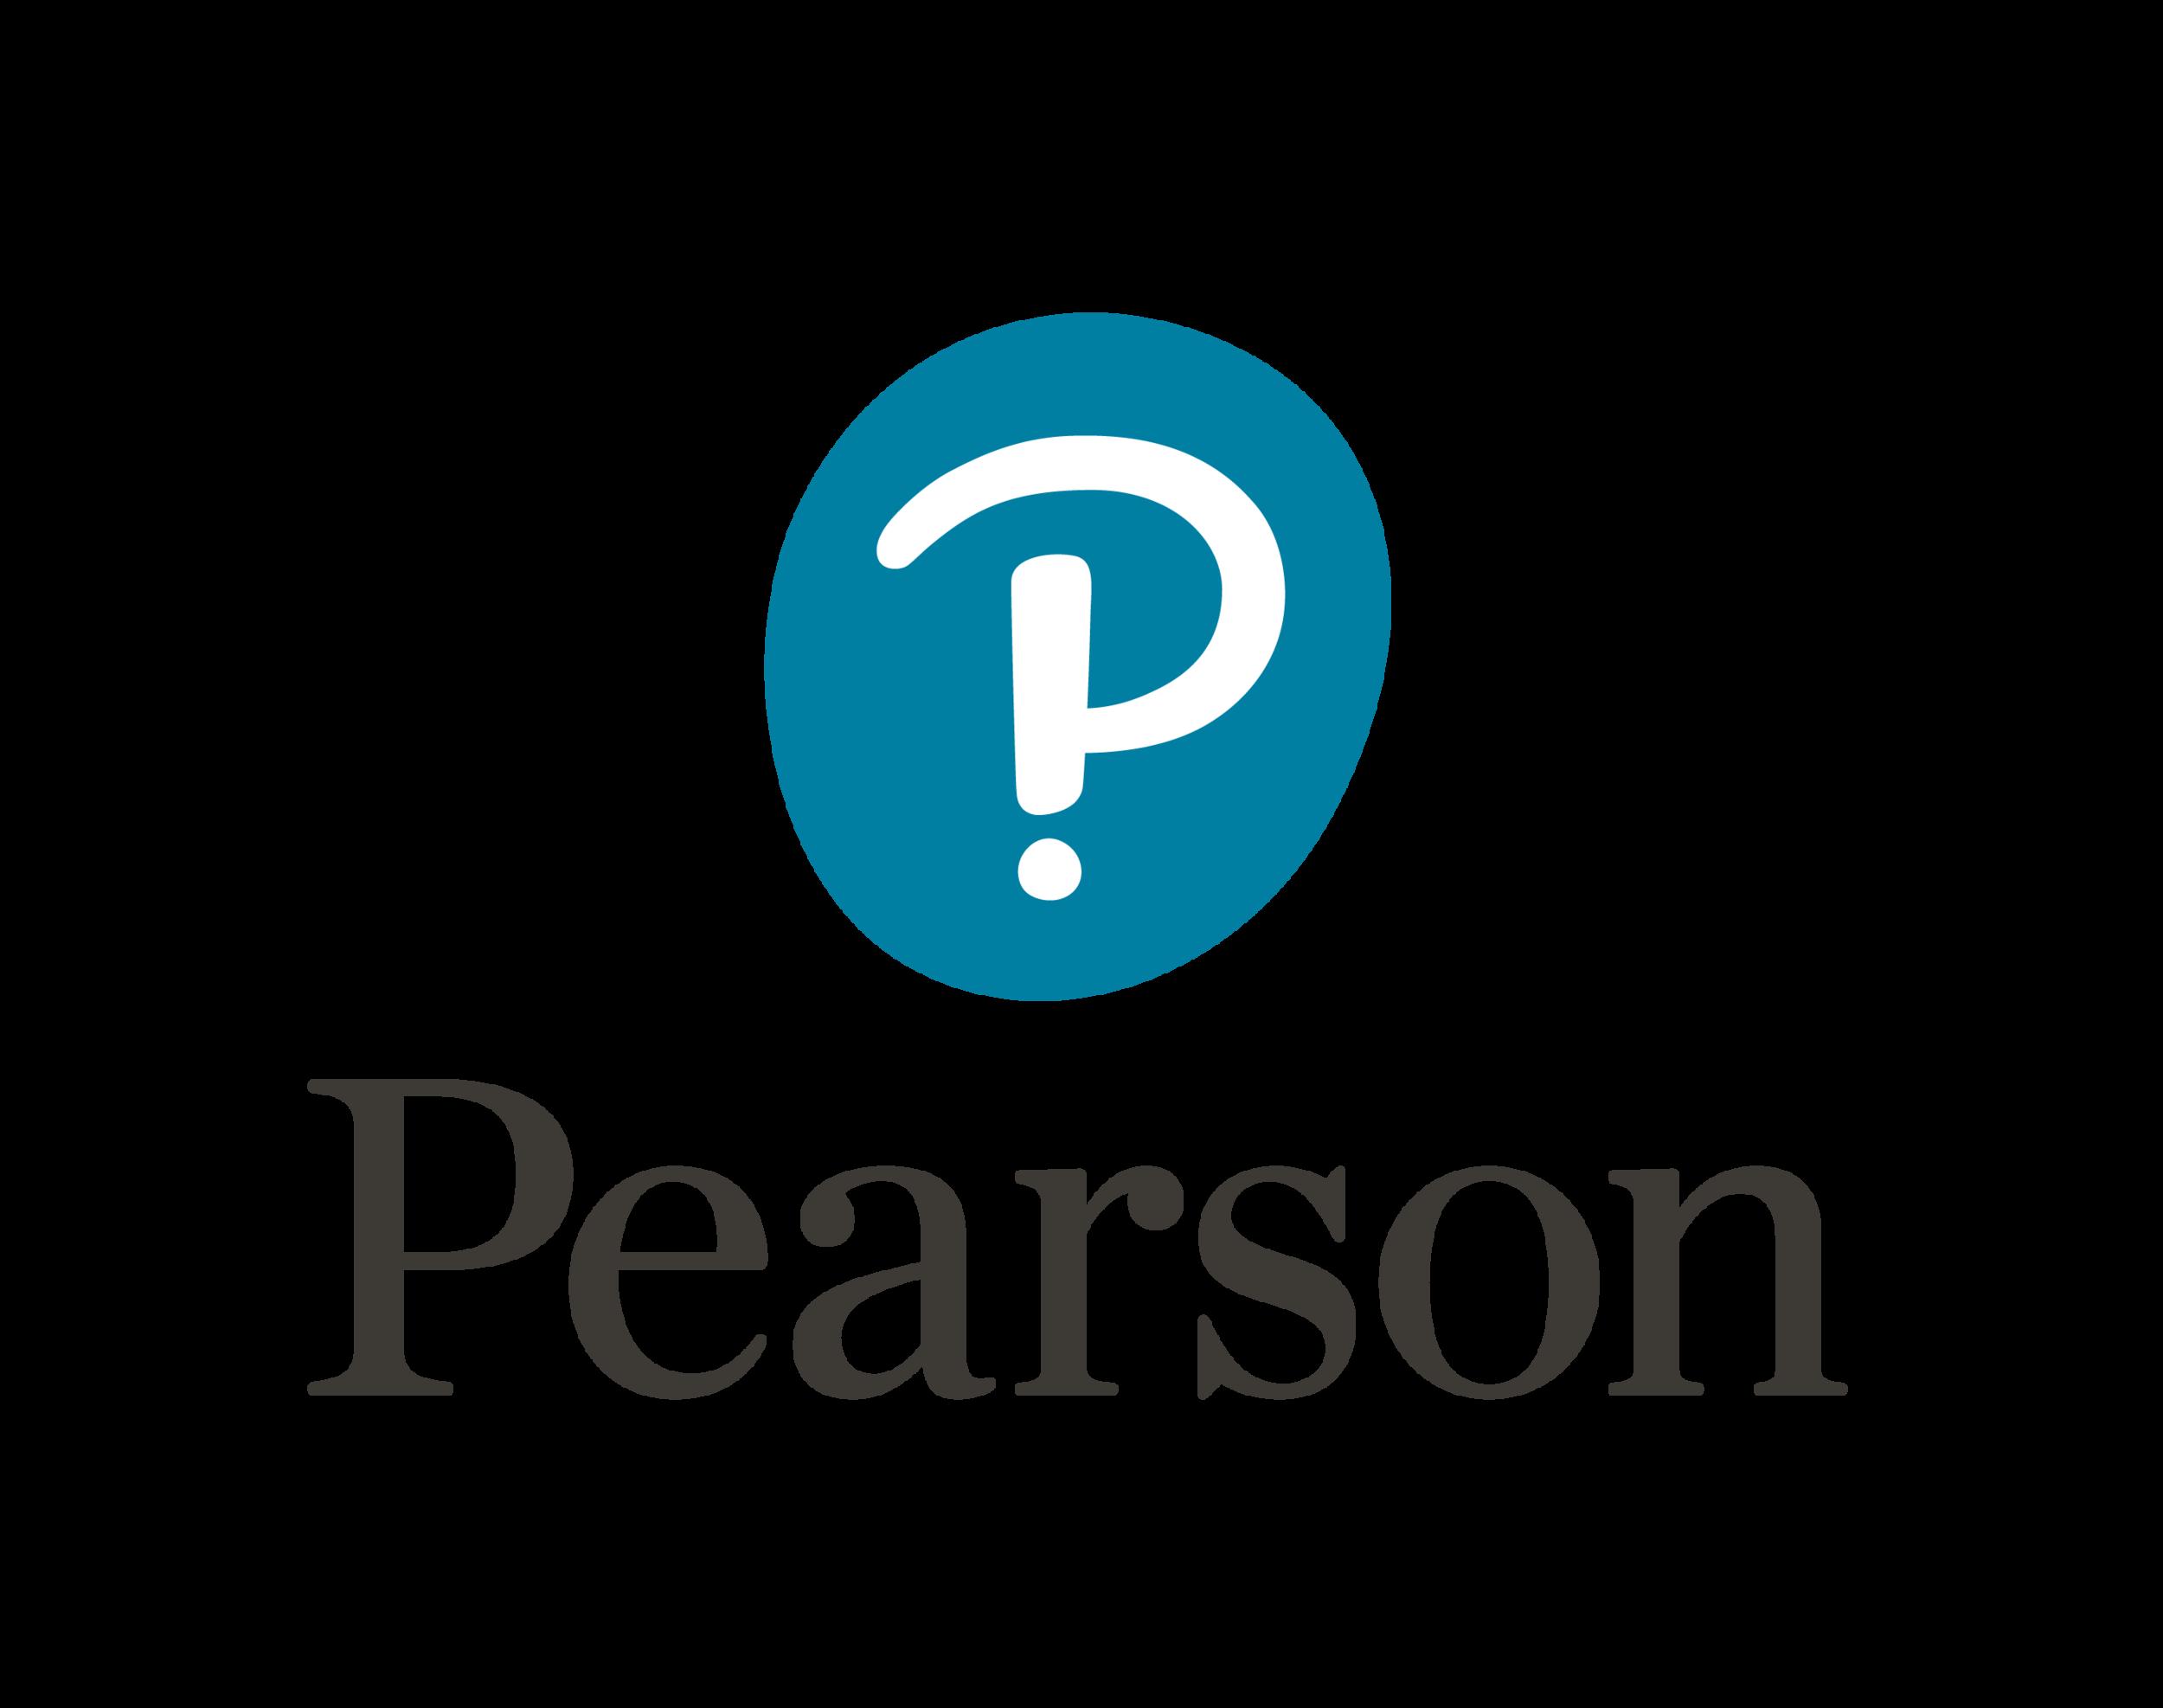 PearsonLogo_Primary_Blk_RGB.png